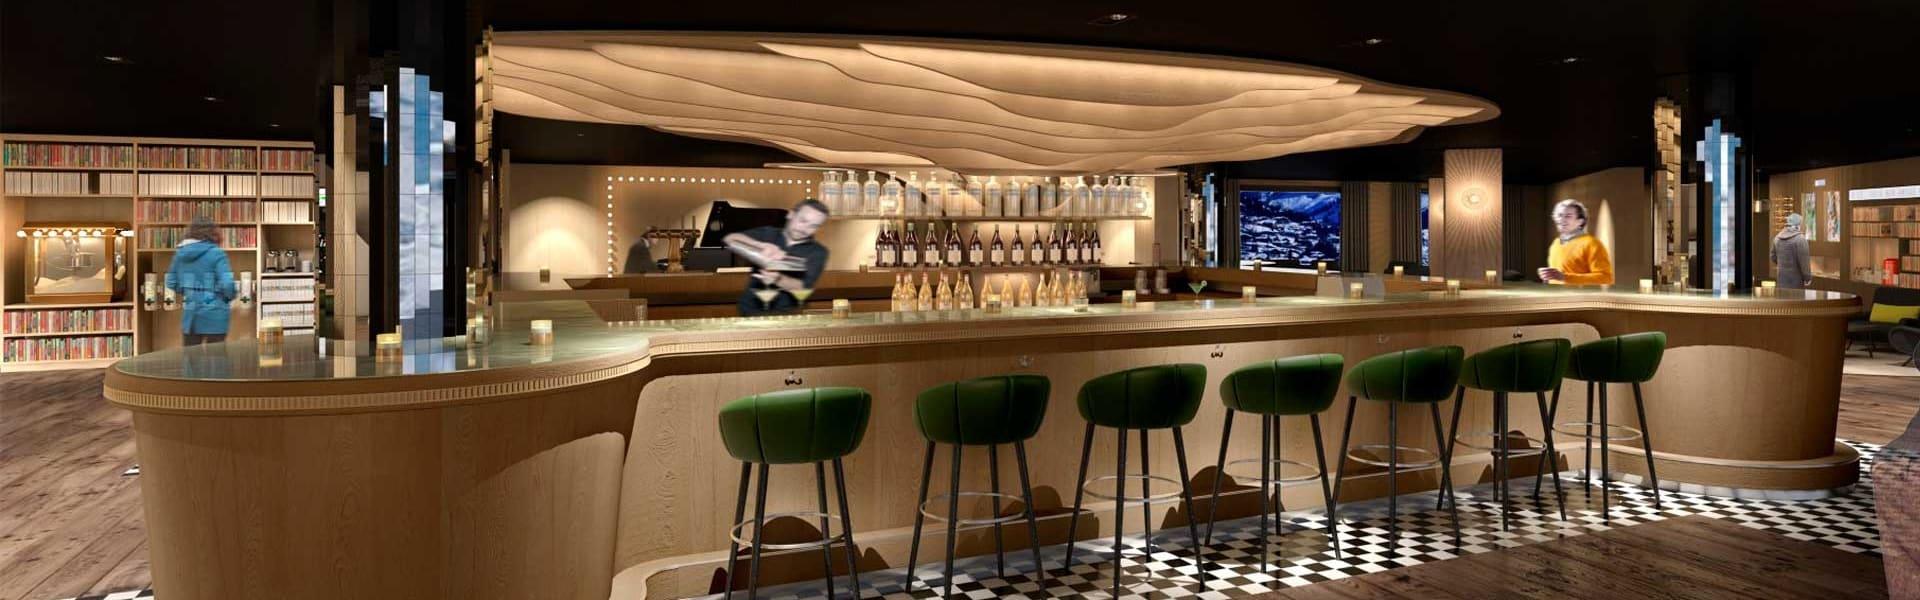 Araucaria Hotel & Spa La Plagne bar serveur